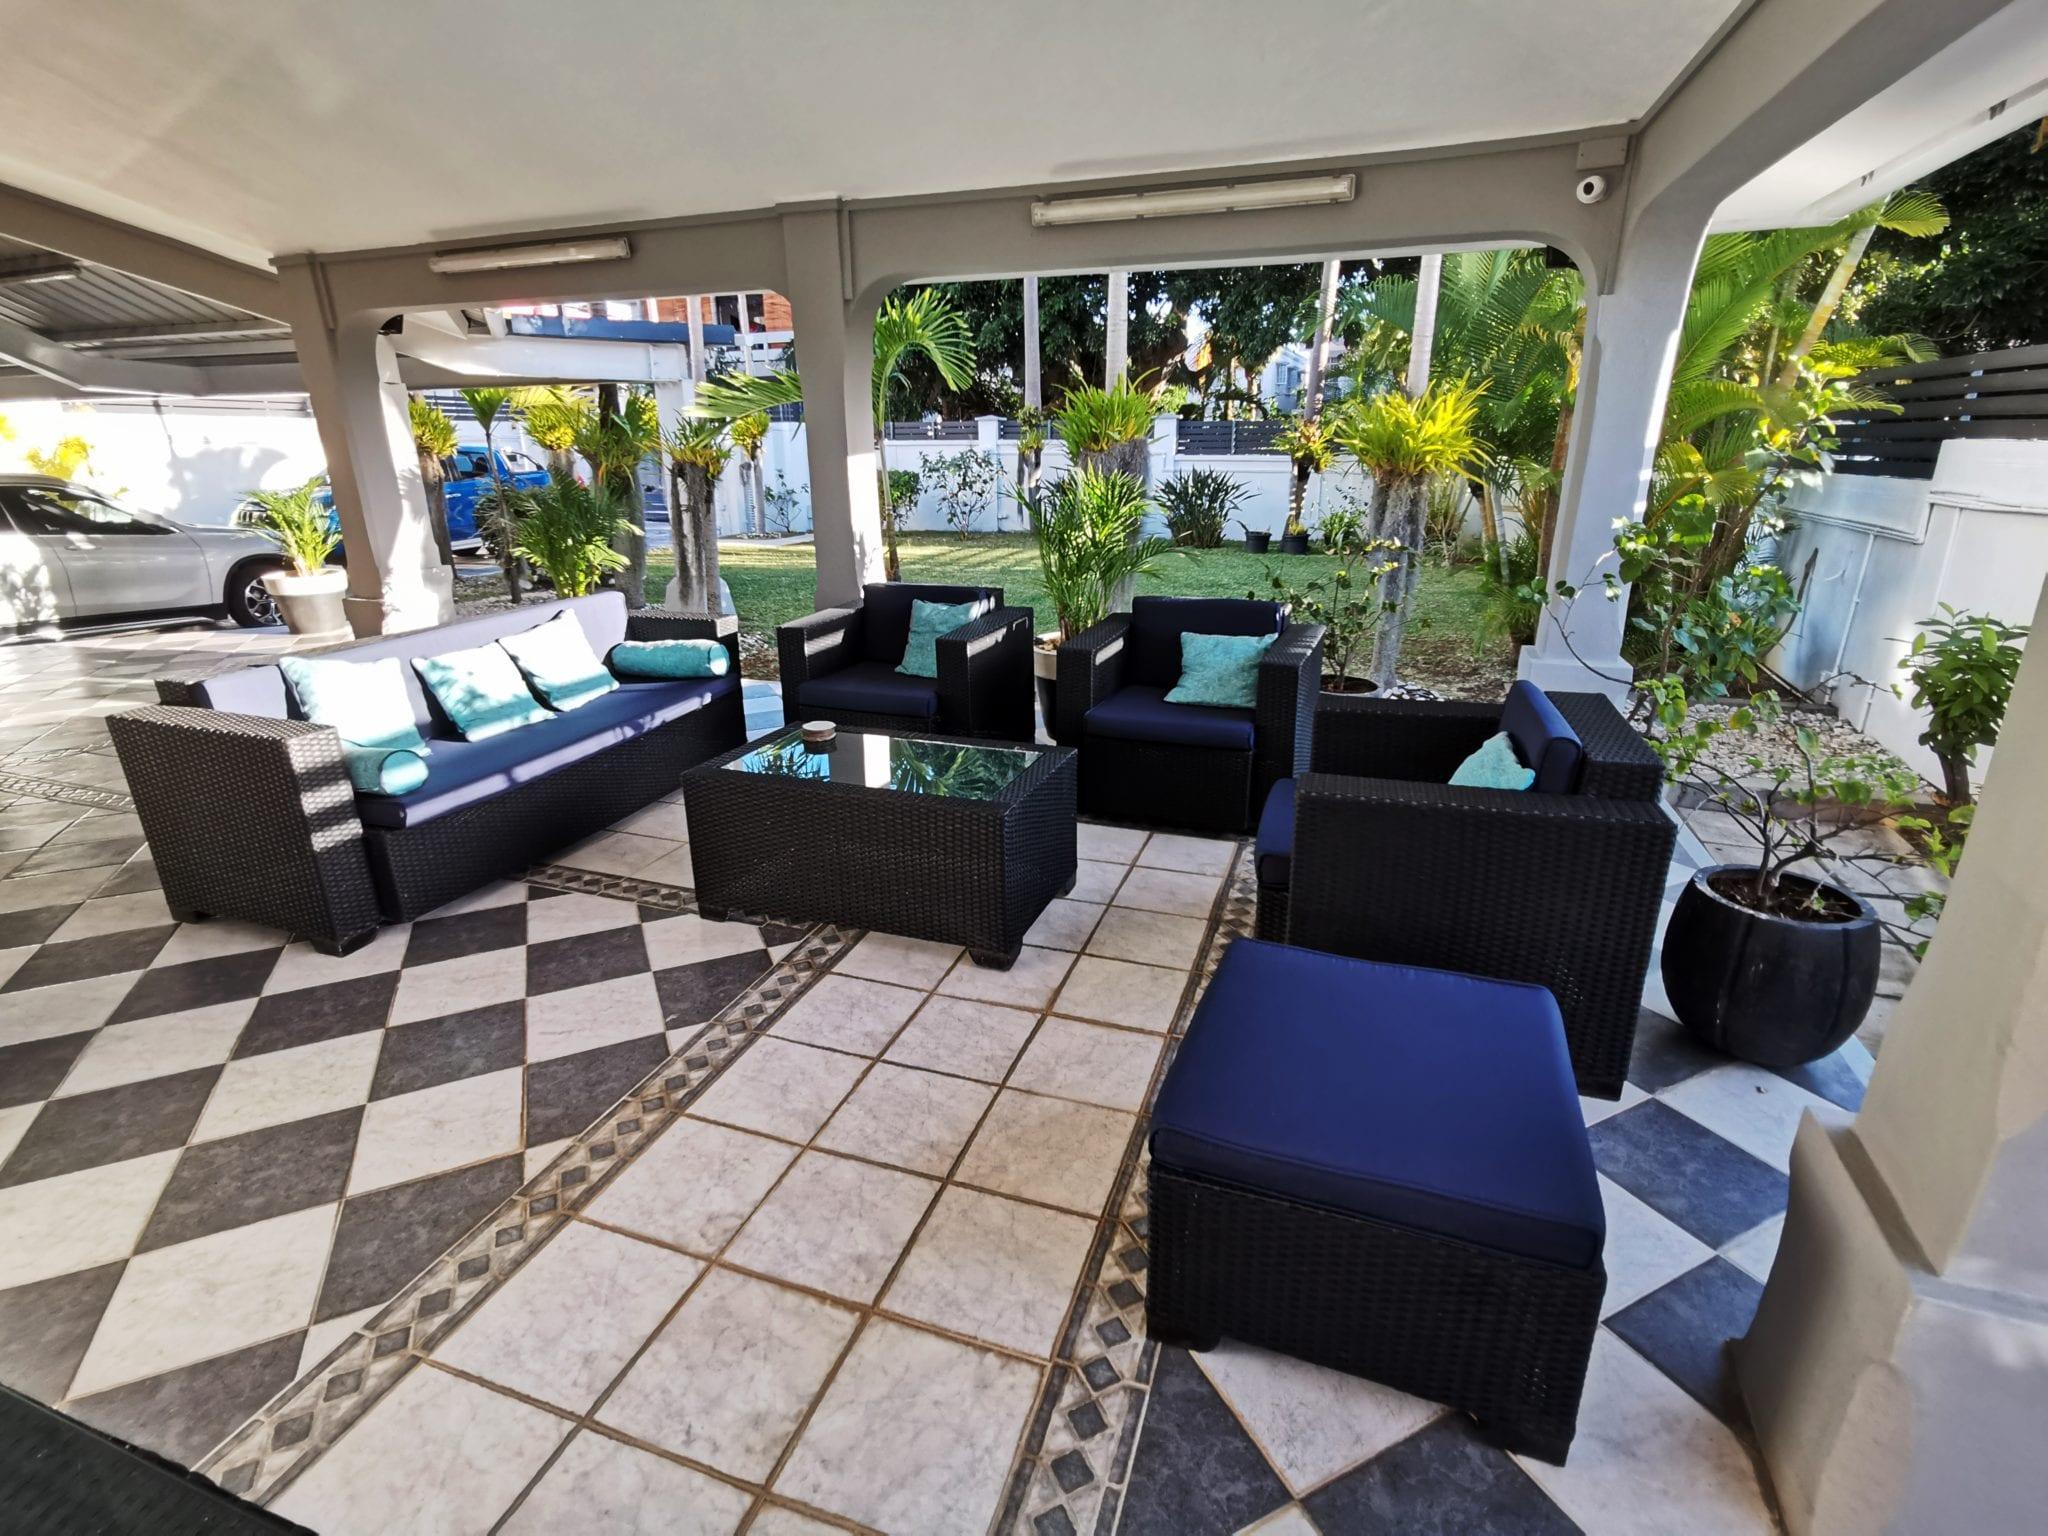 Quatre Bornes – Family house with priceless elegance